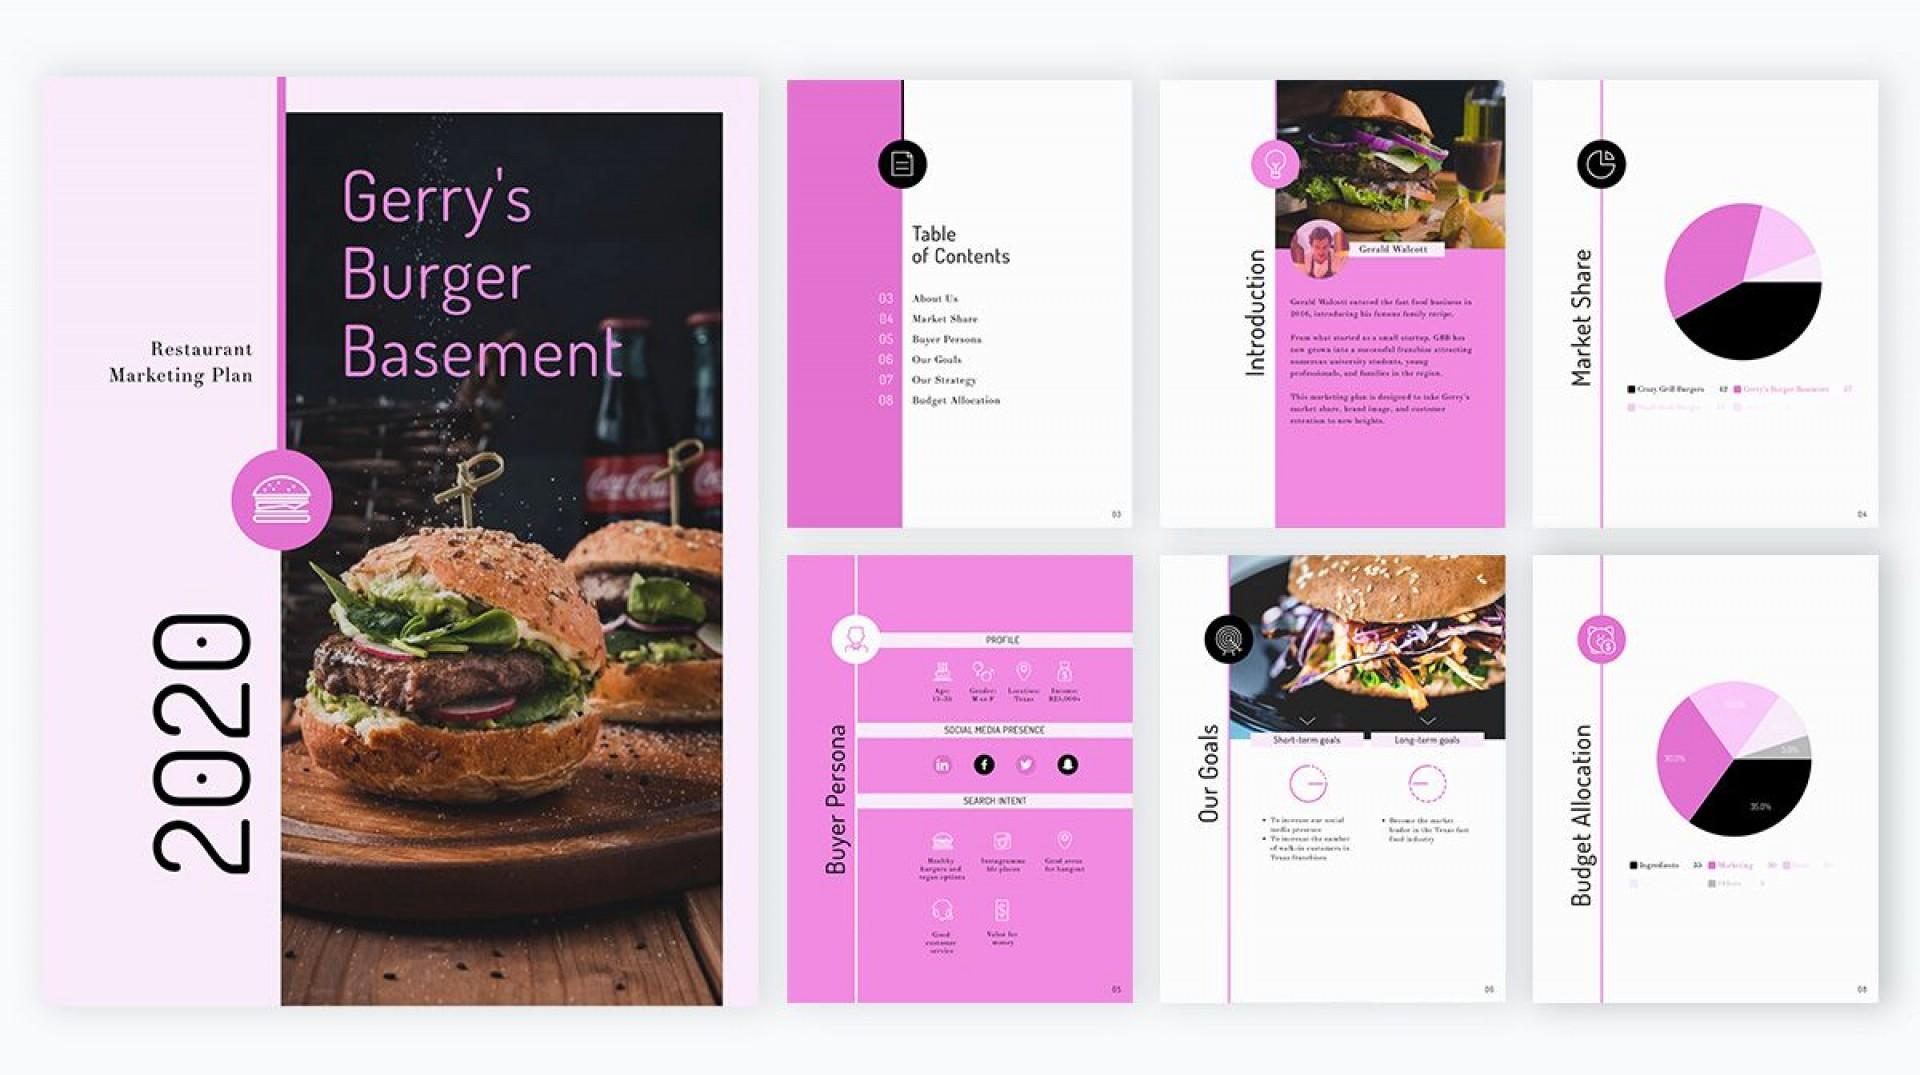 009 Singular Restaurant Marketing Plan Template Free Download Inspiration 1920